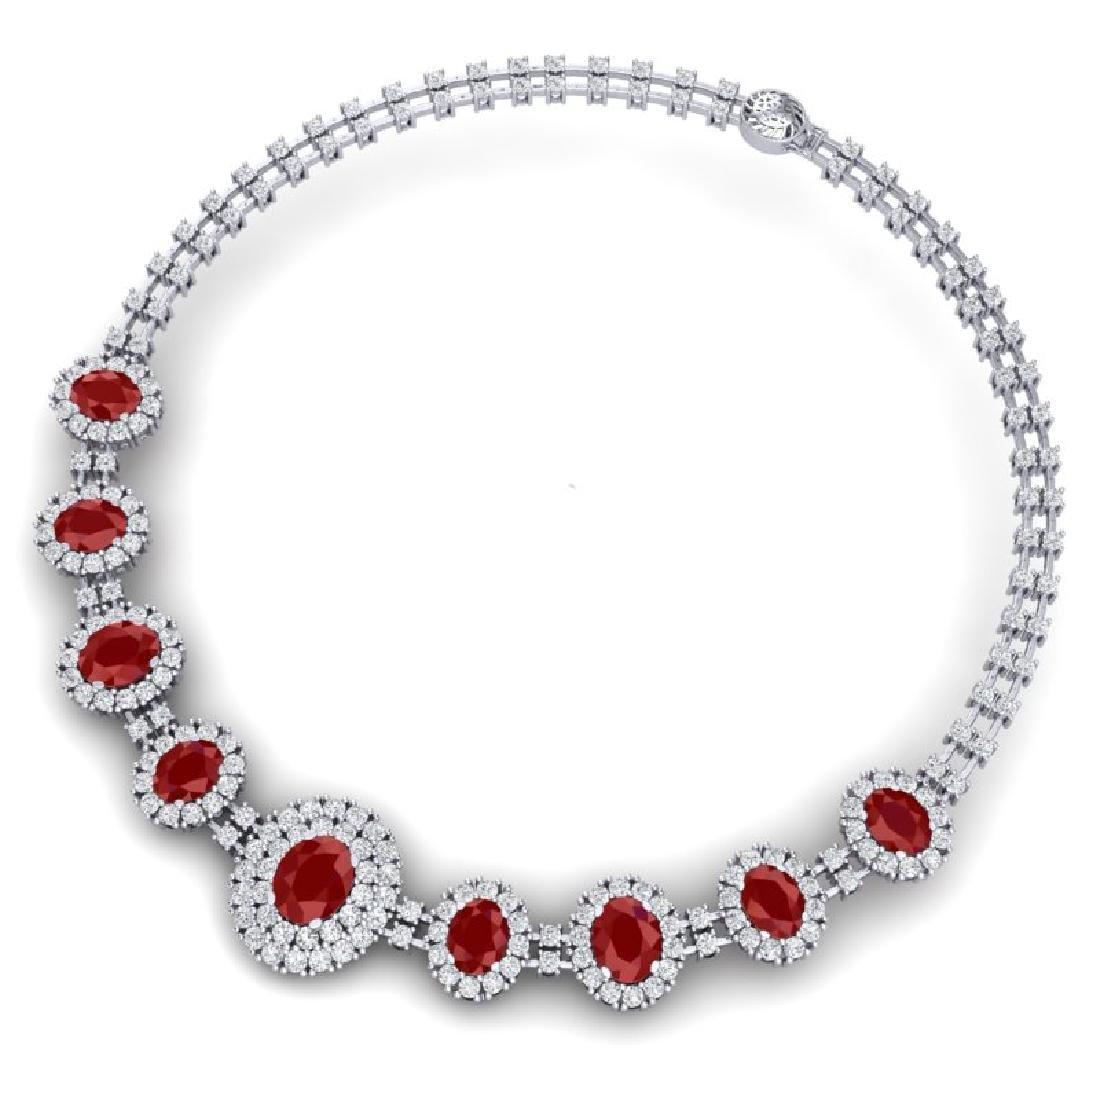 45.69 CTW Royalty Ruby & VS Diamond Necklace 18K White - 3